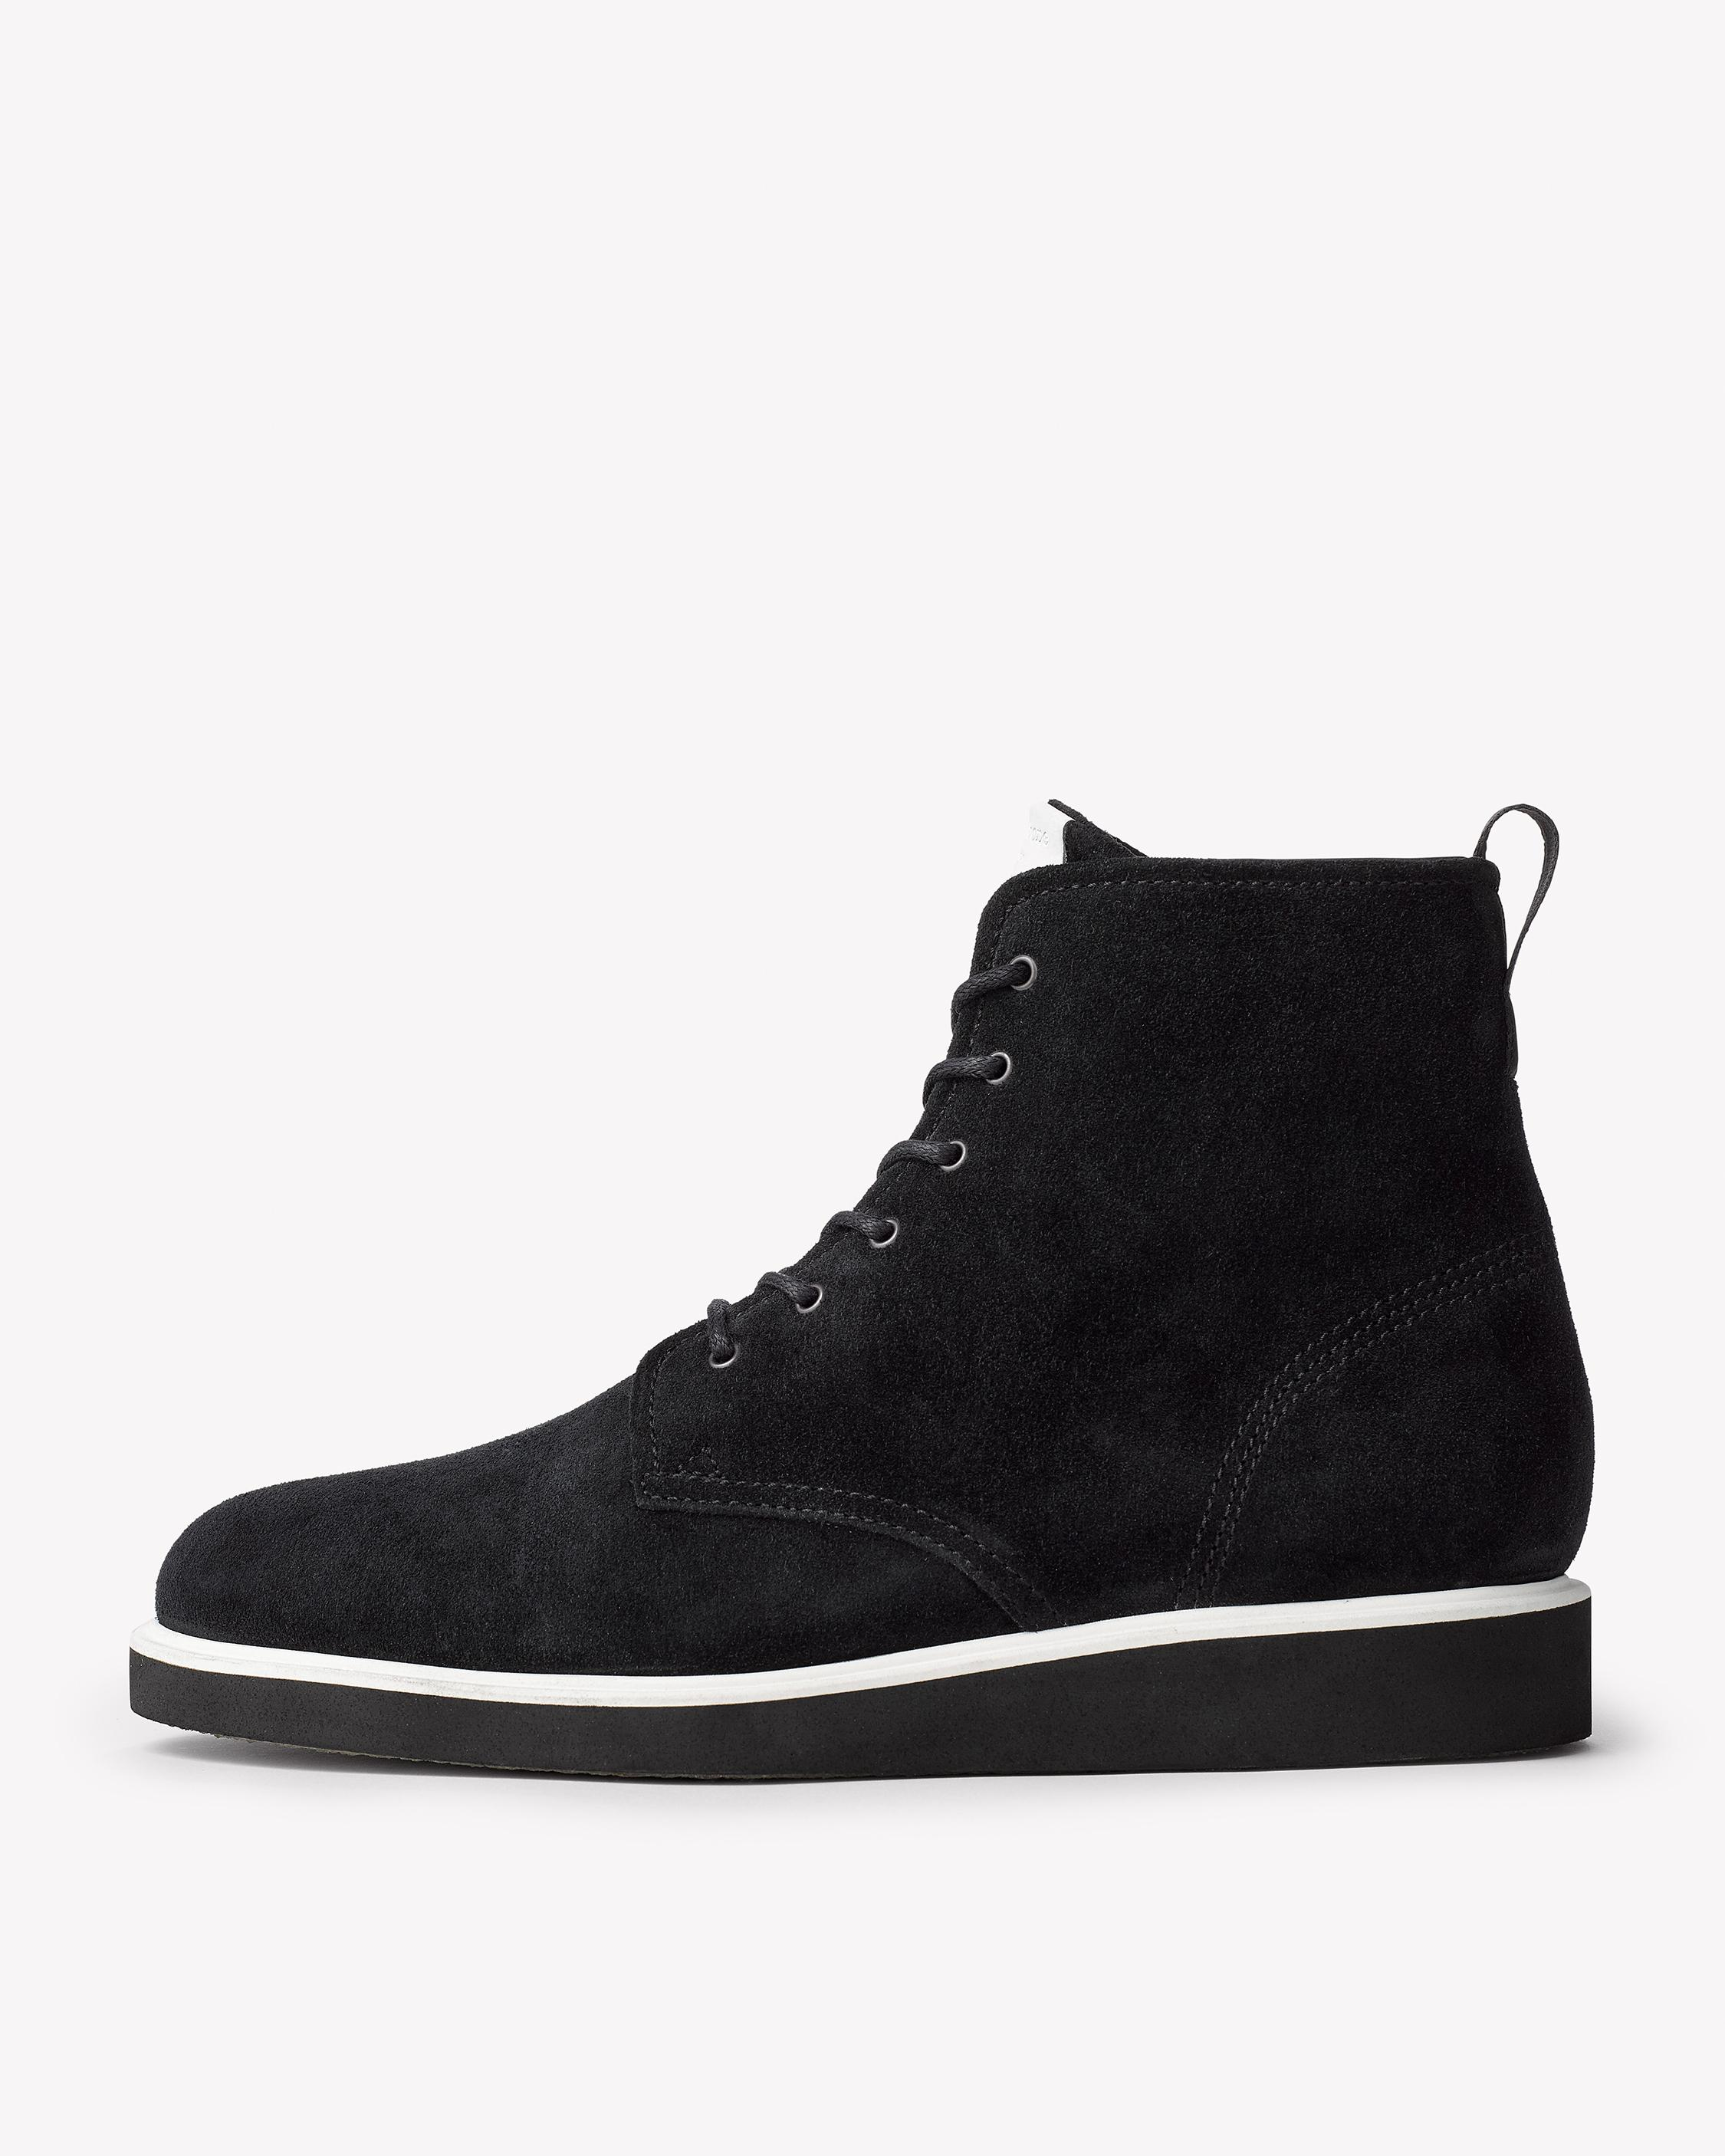 Rag & Bone Black Elliot Boots 8AyYaTq